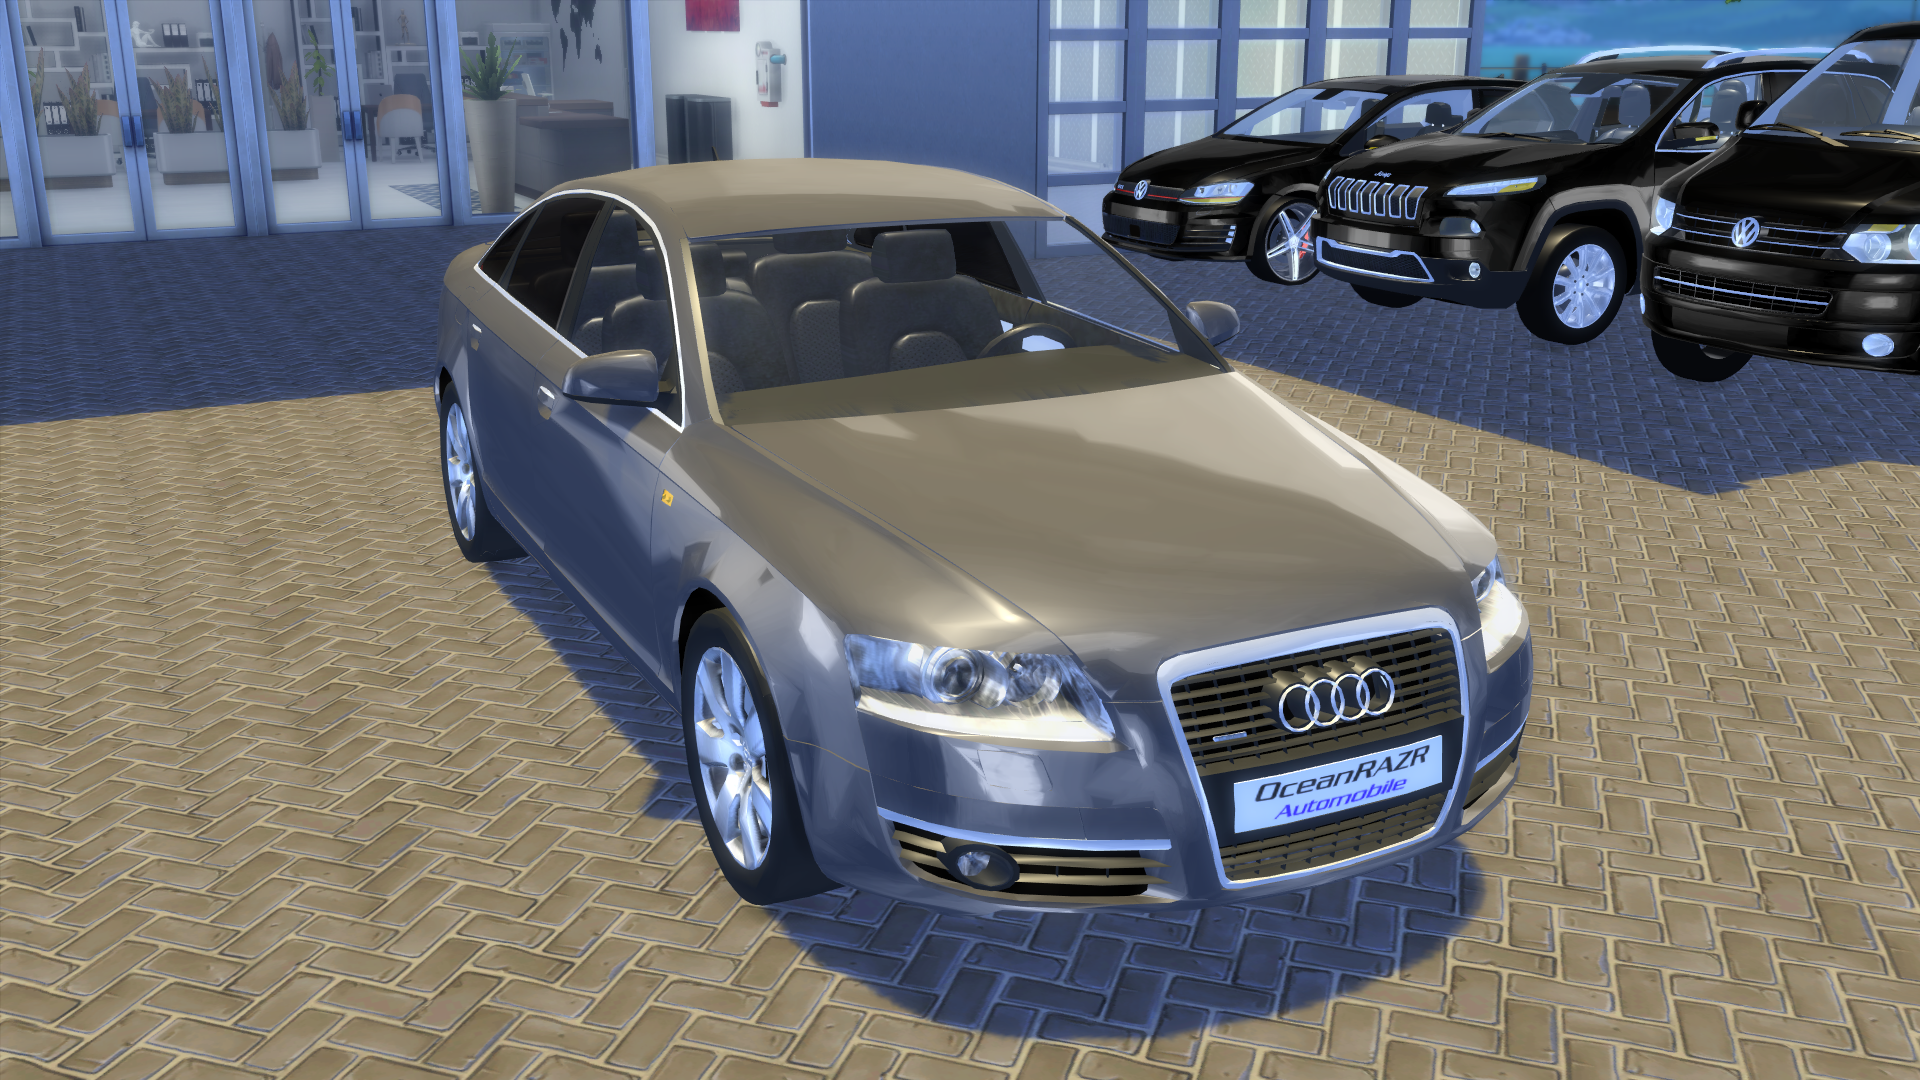 Sims 4 Cars - The Car Database